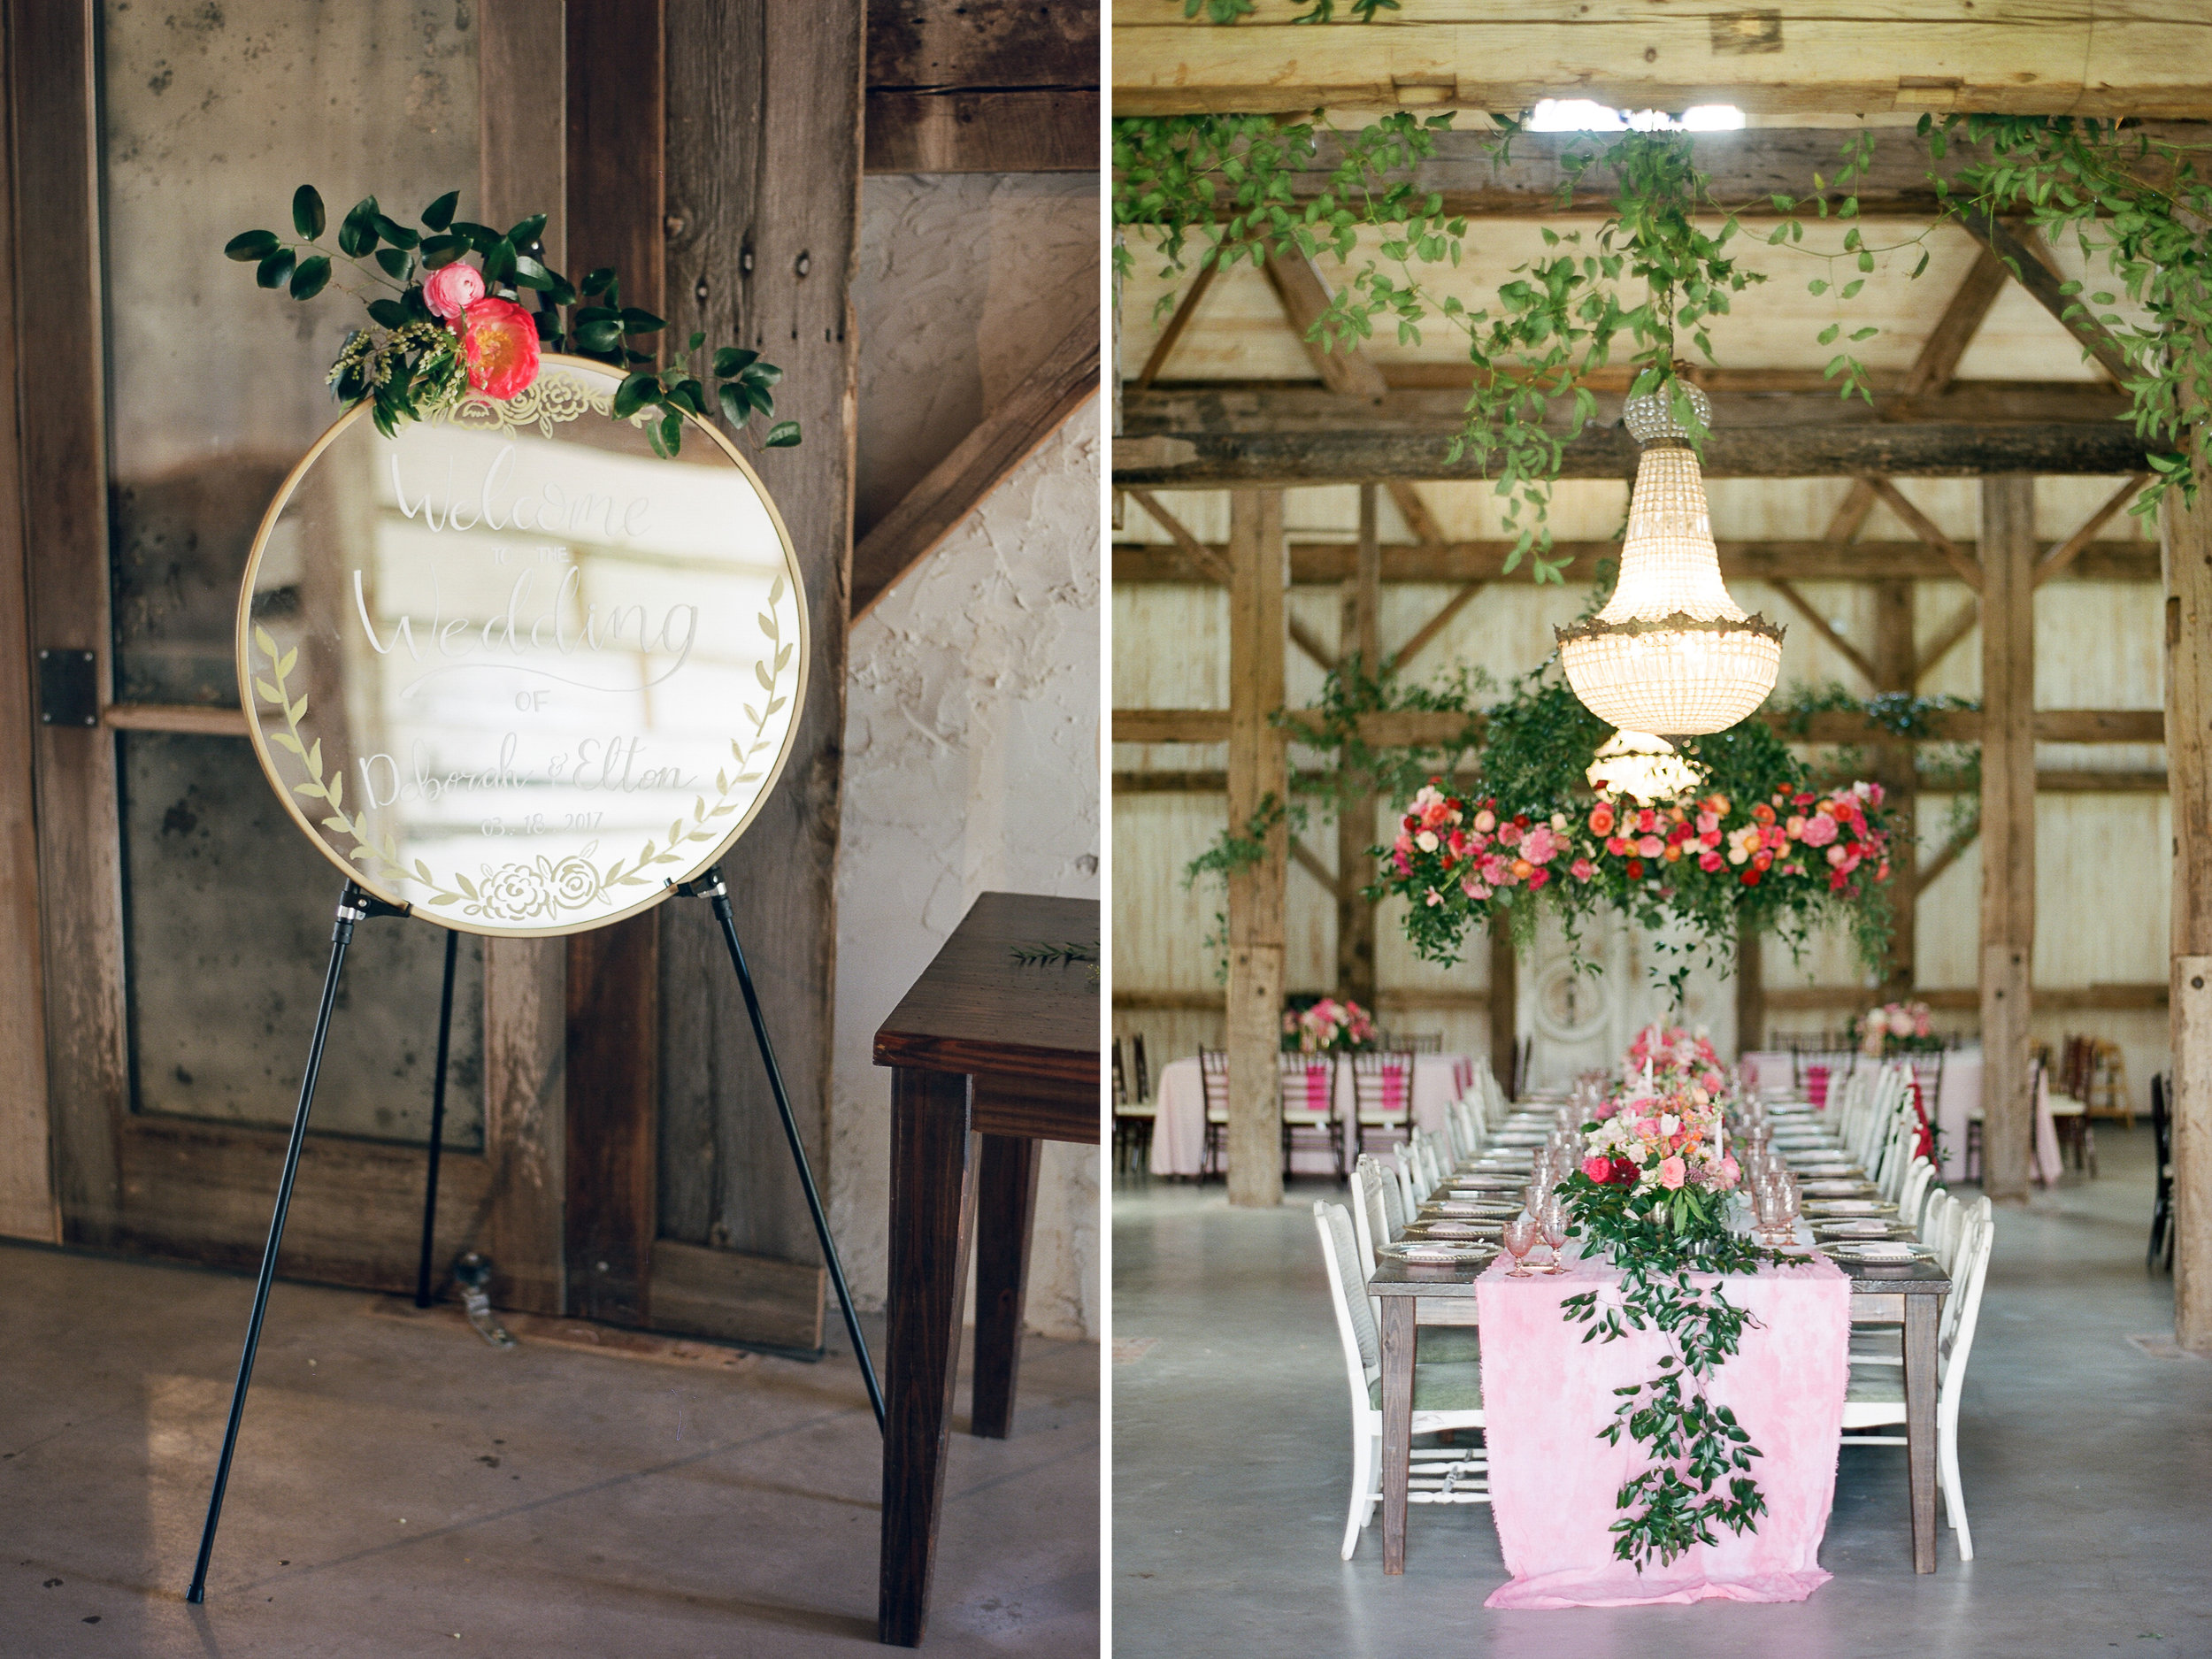 The-Knot-50-Weddings-50-States-Texas-Winner-Dana-Fernandez-photography-houston-wedding-photographer-film-fine-art-destination-162.jpg